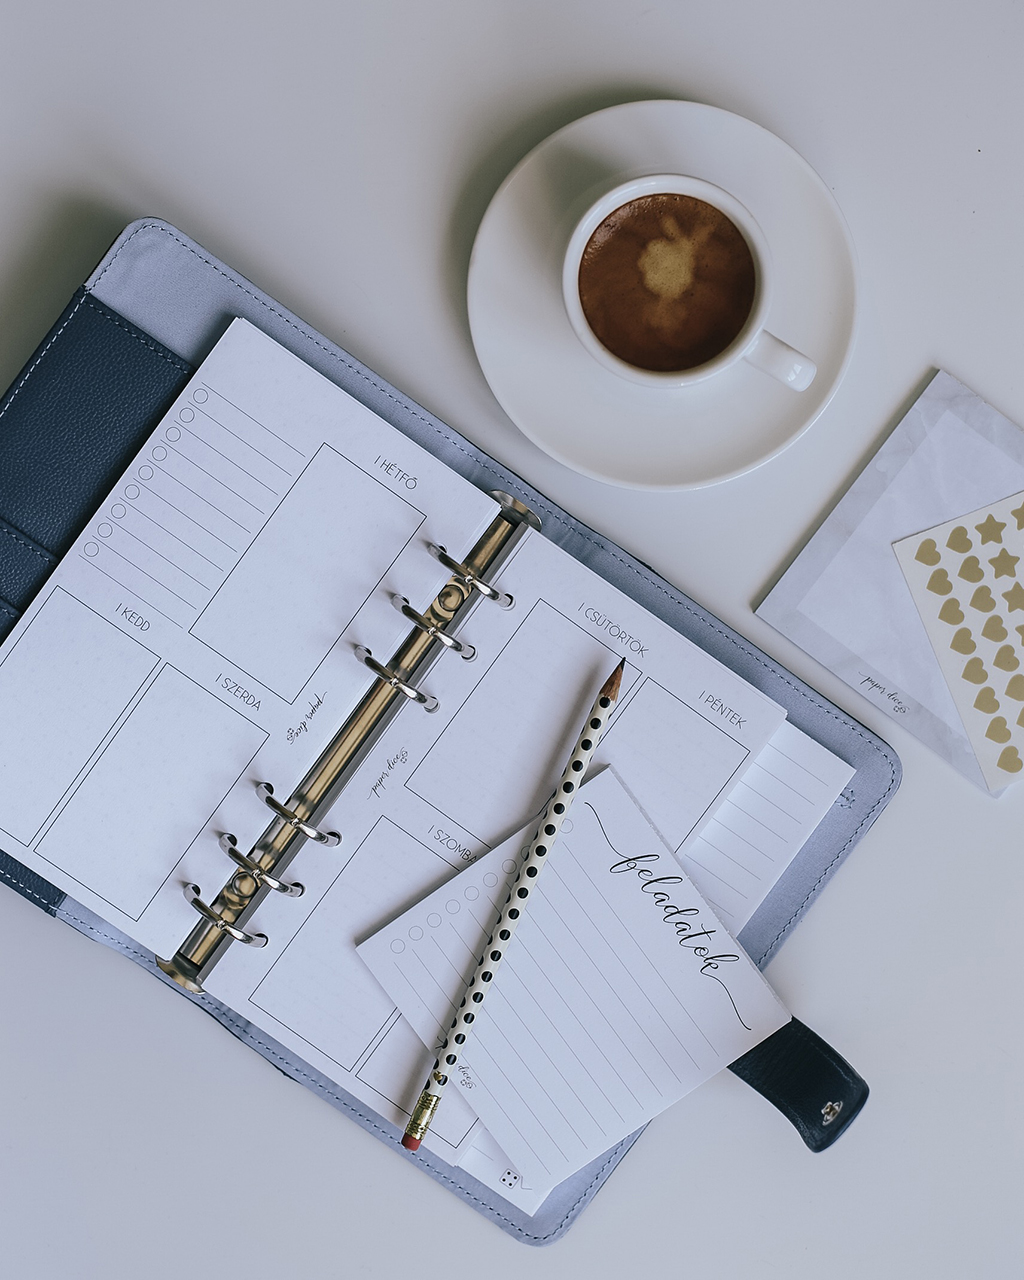 paperdice_planner_8